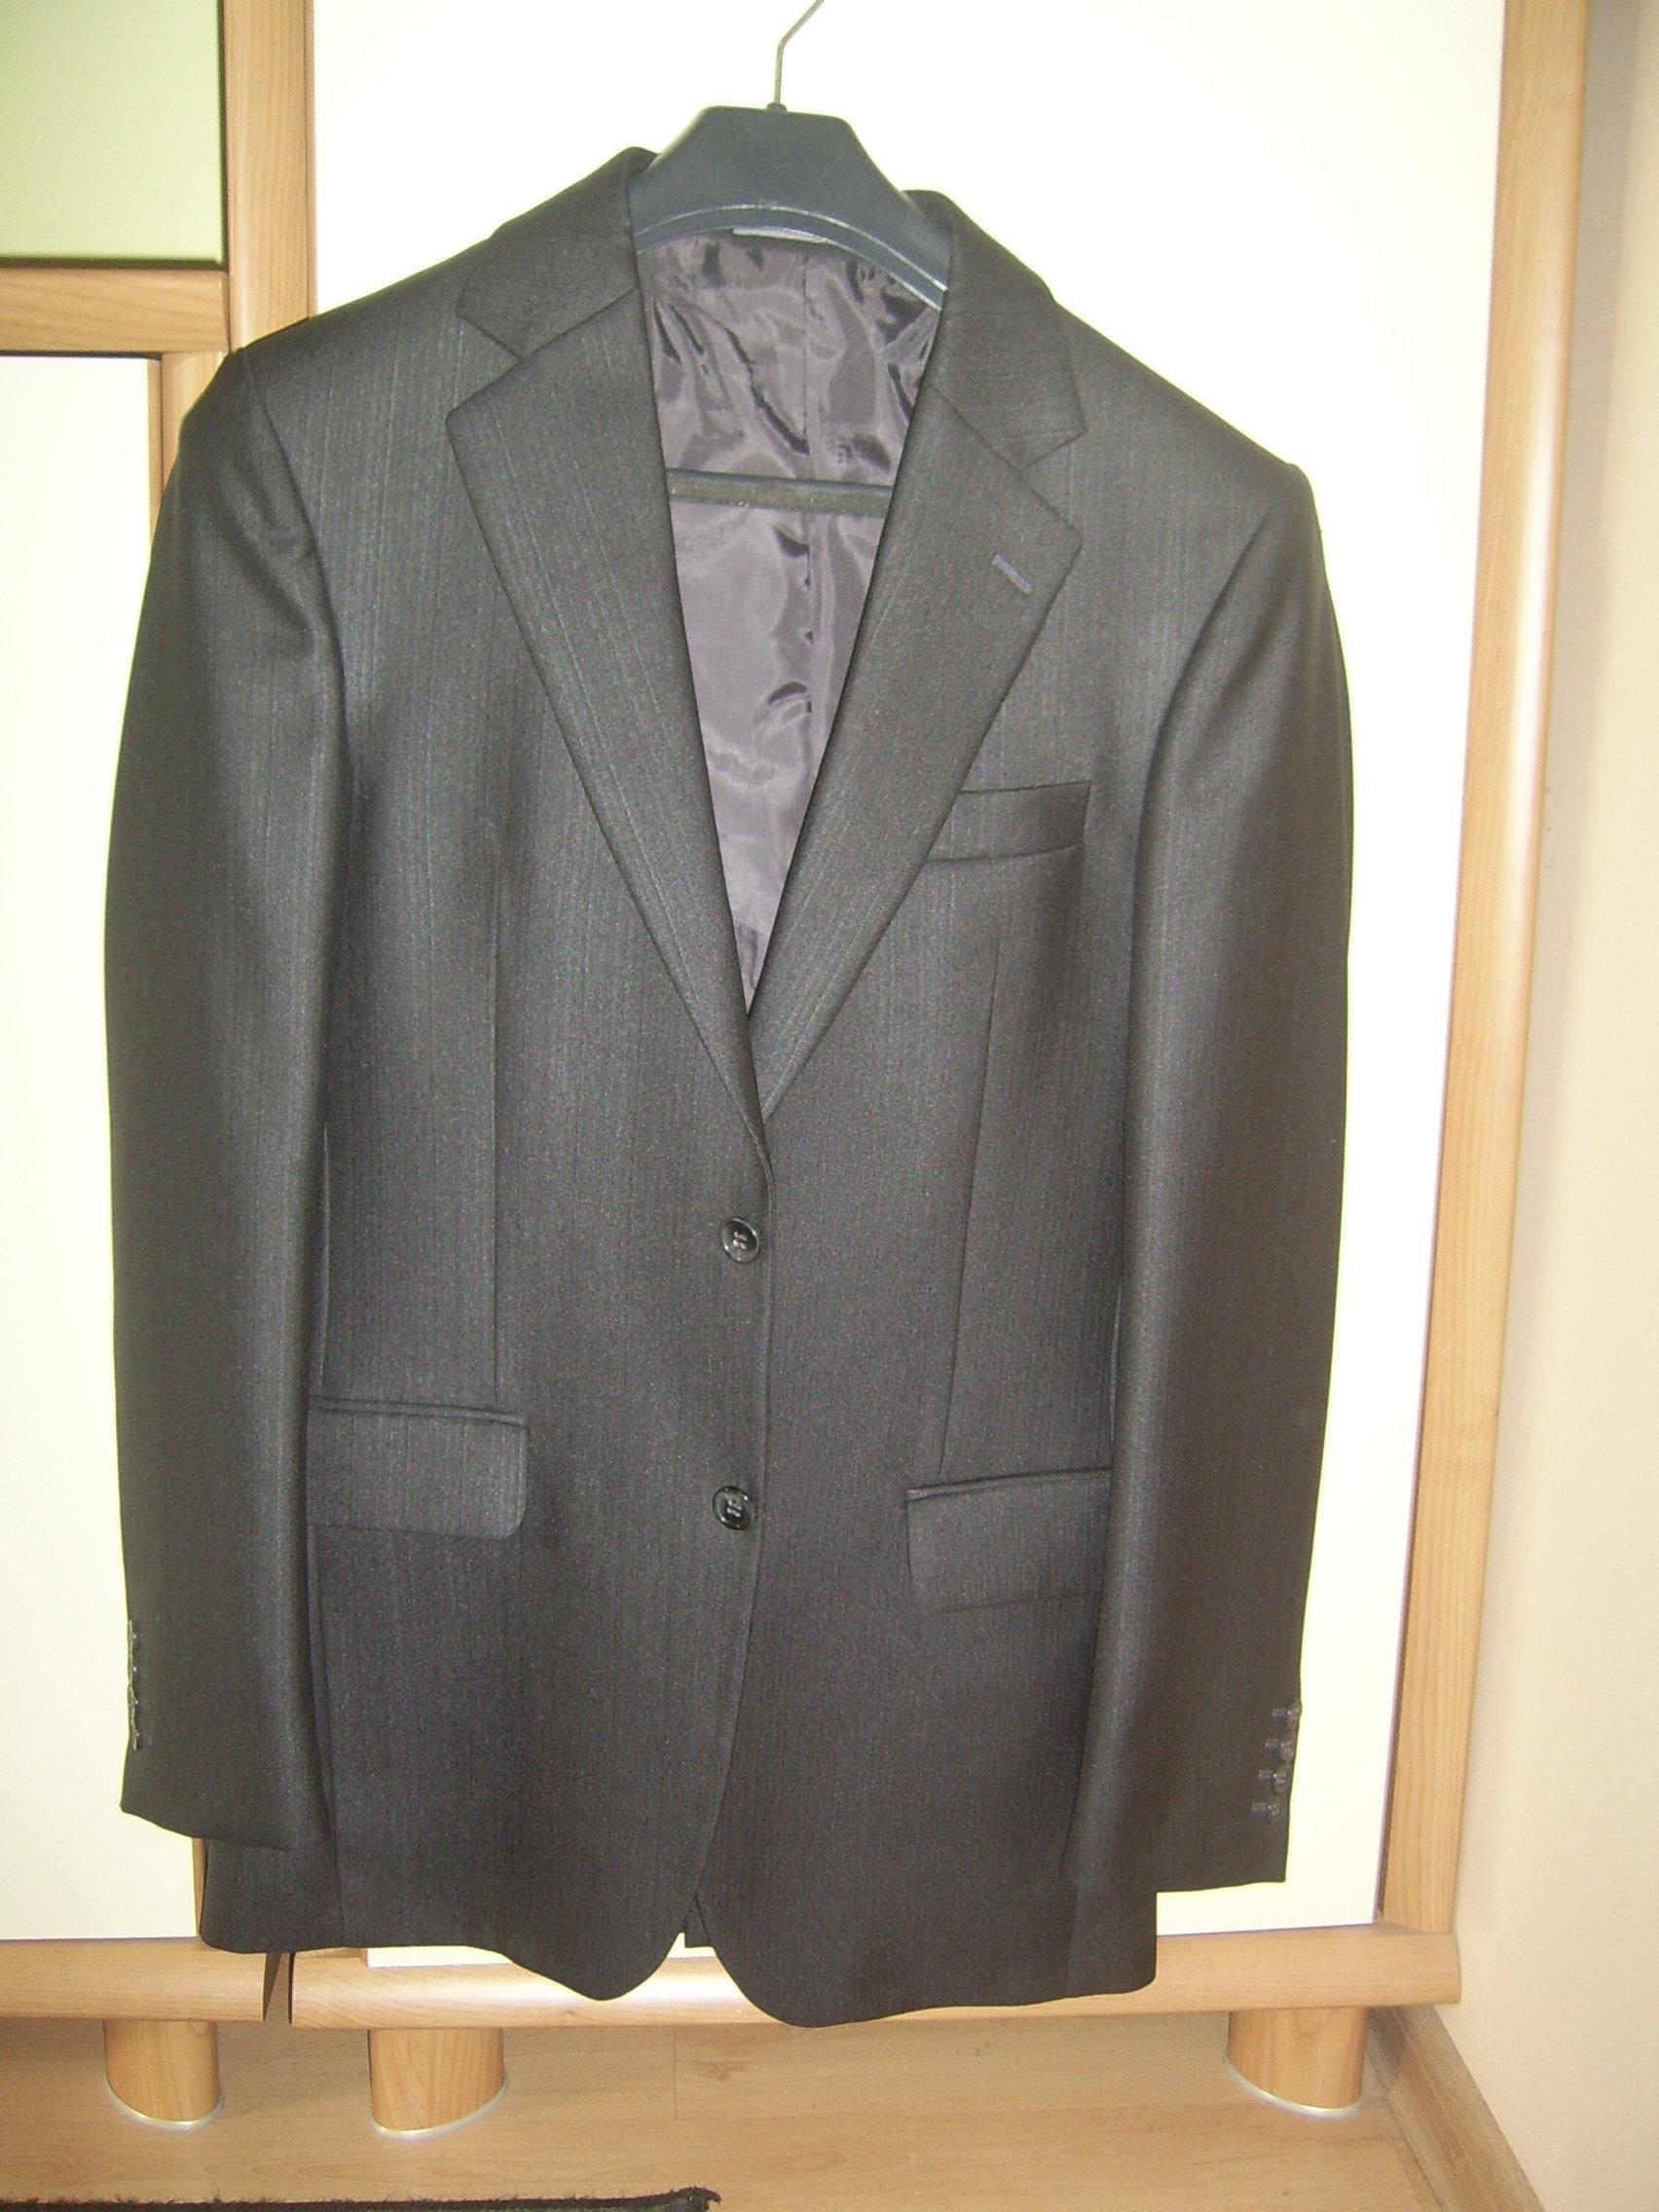 f773f36b5a4e8 Elegancki garnitur męski w roz 182/92/80 - 7194042837 - oficjalne ...